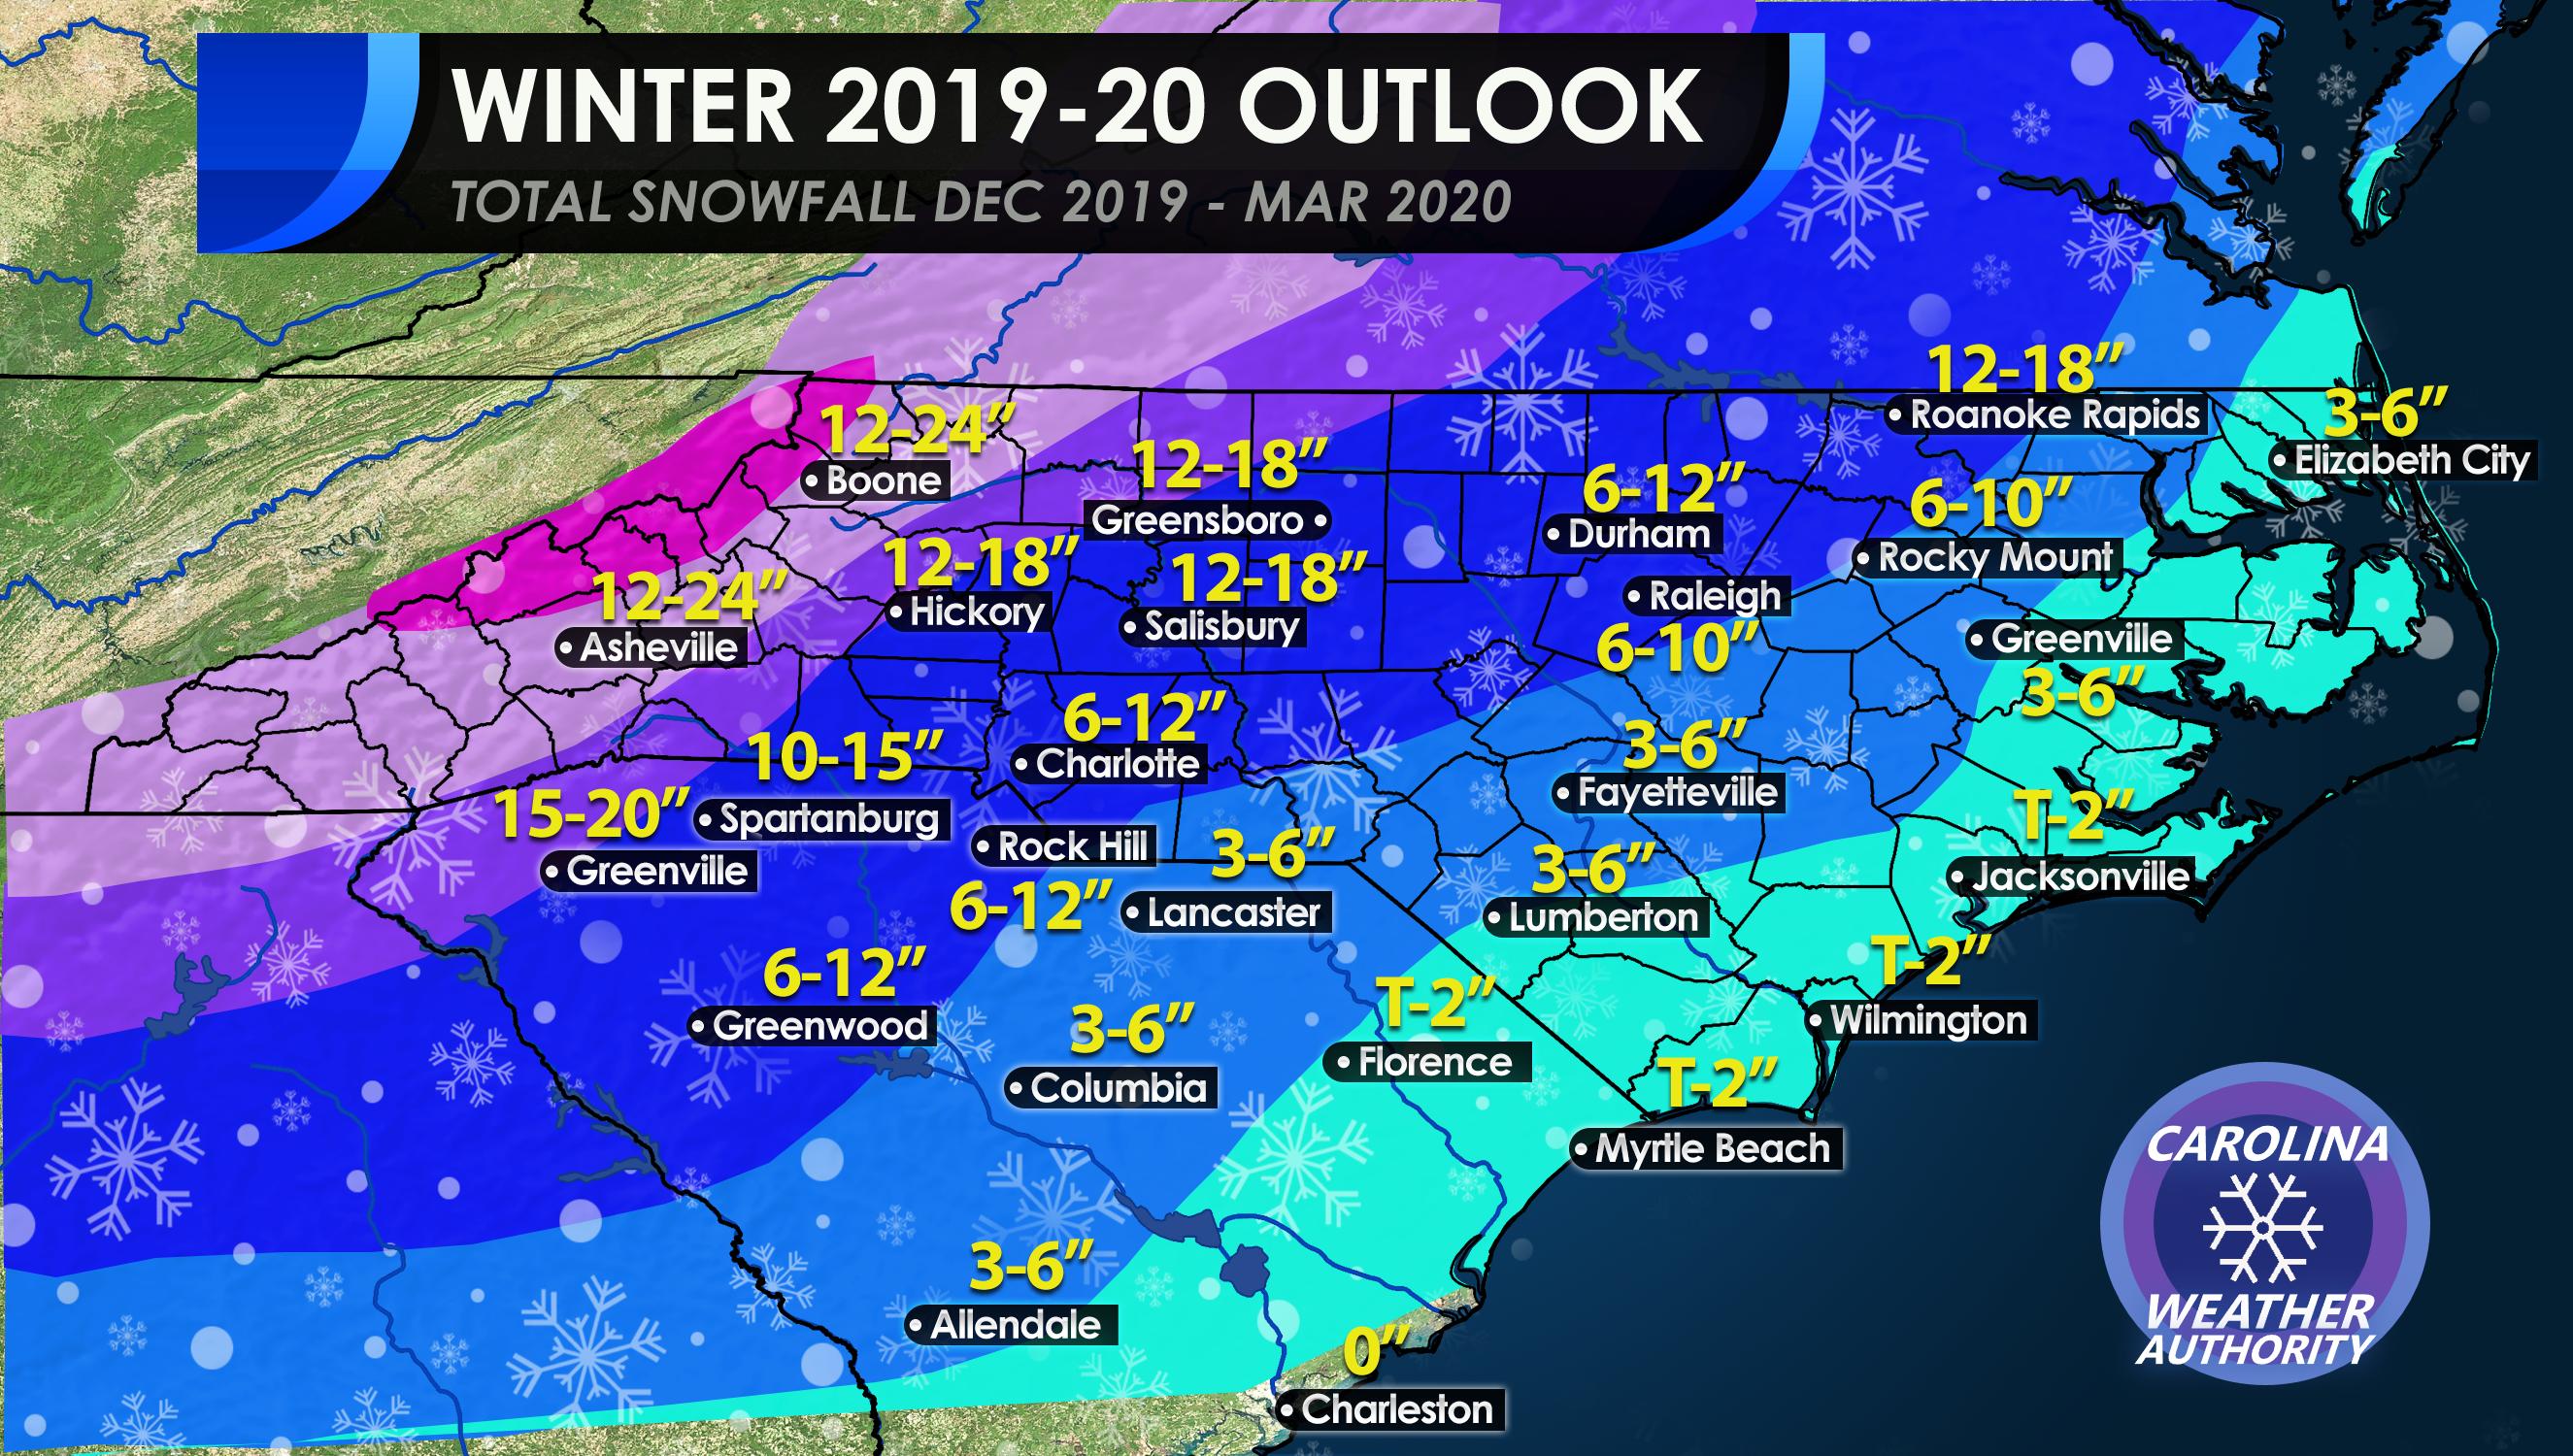 Carolinas Winter 2019 2020 Total Snow Outlook